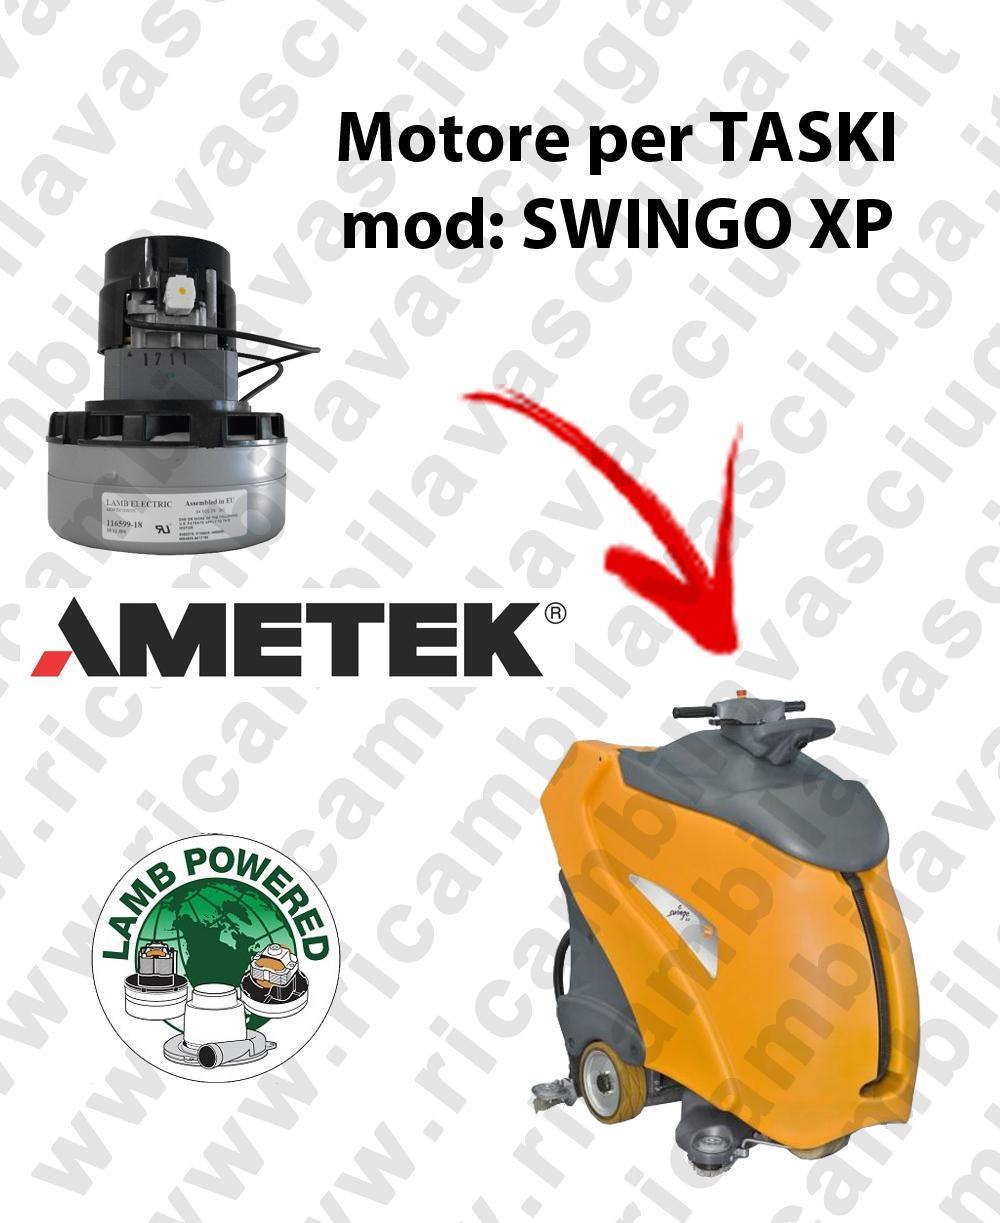 SWINGO XP Motore de aspiración LAMB AMETEK para fregadora TASKI